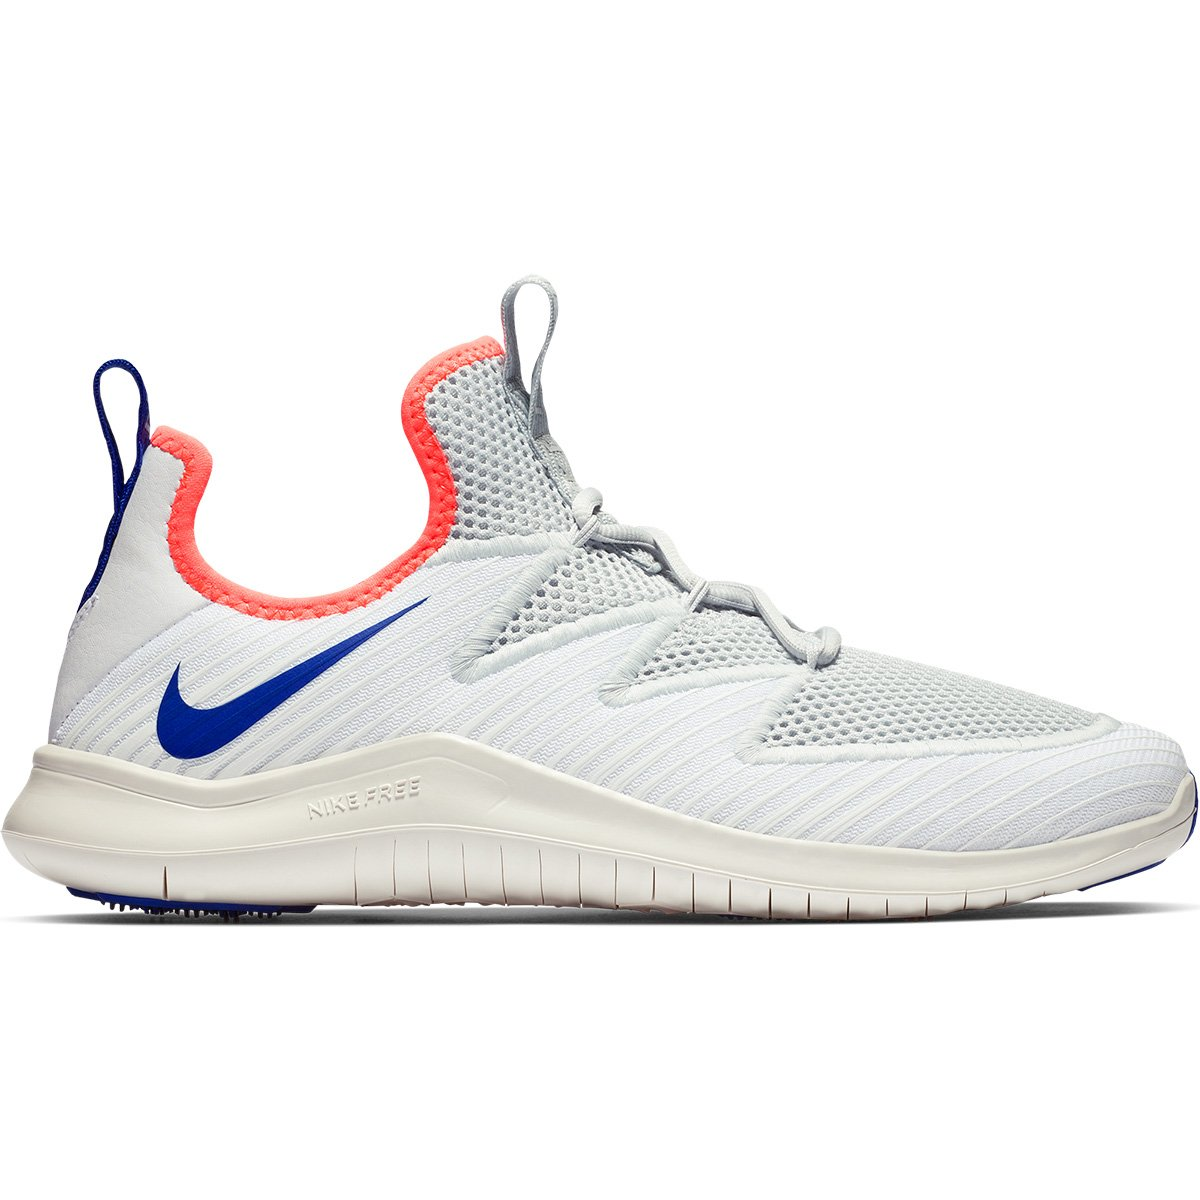 97218d647d1 Tênis Nike Free Tr Ultra Masculino - Branco - Compre Agora